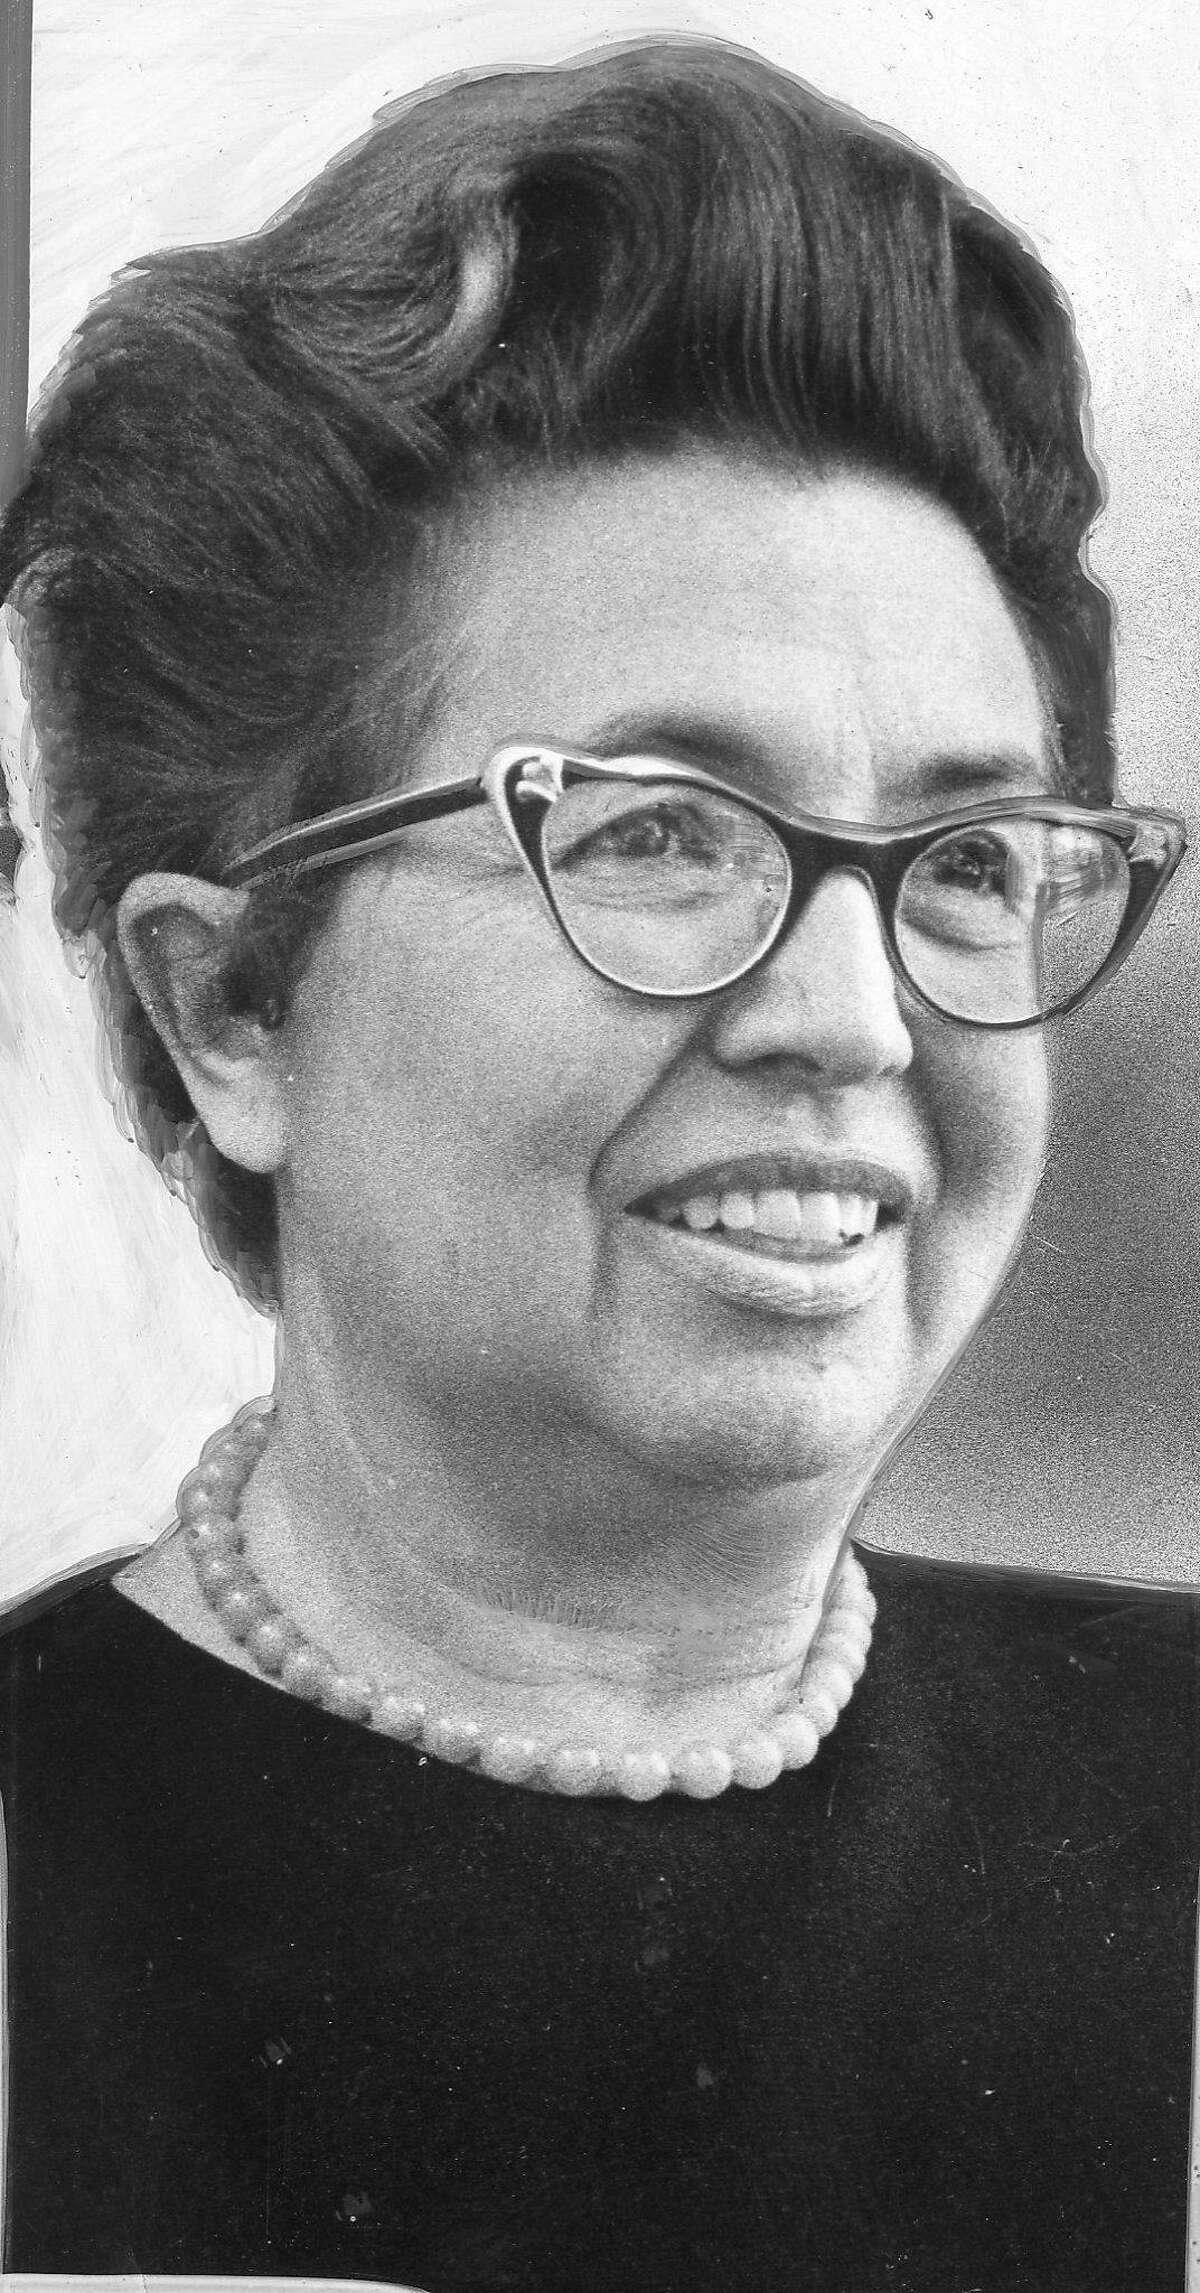 Miriam E. Wolff, San Francisco Port Director, January 27, 1970